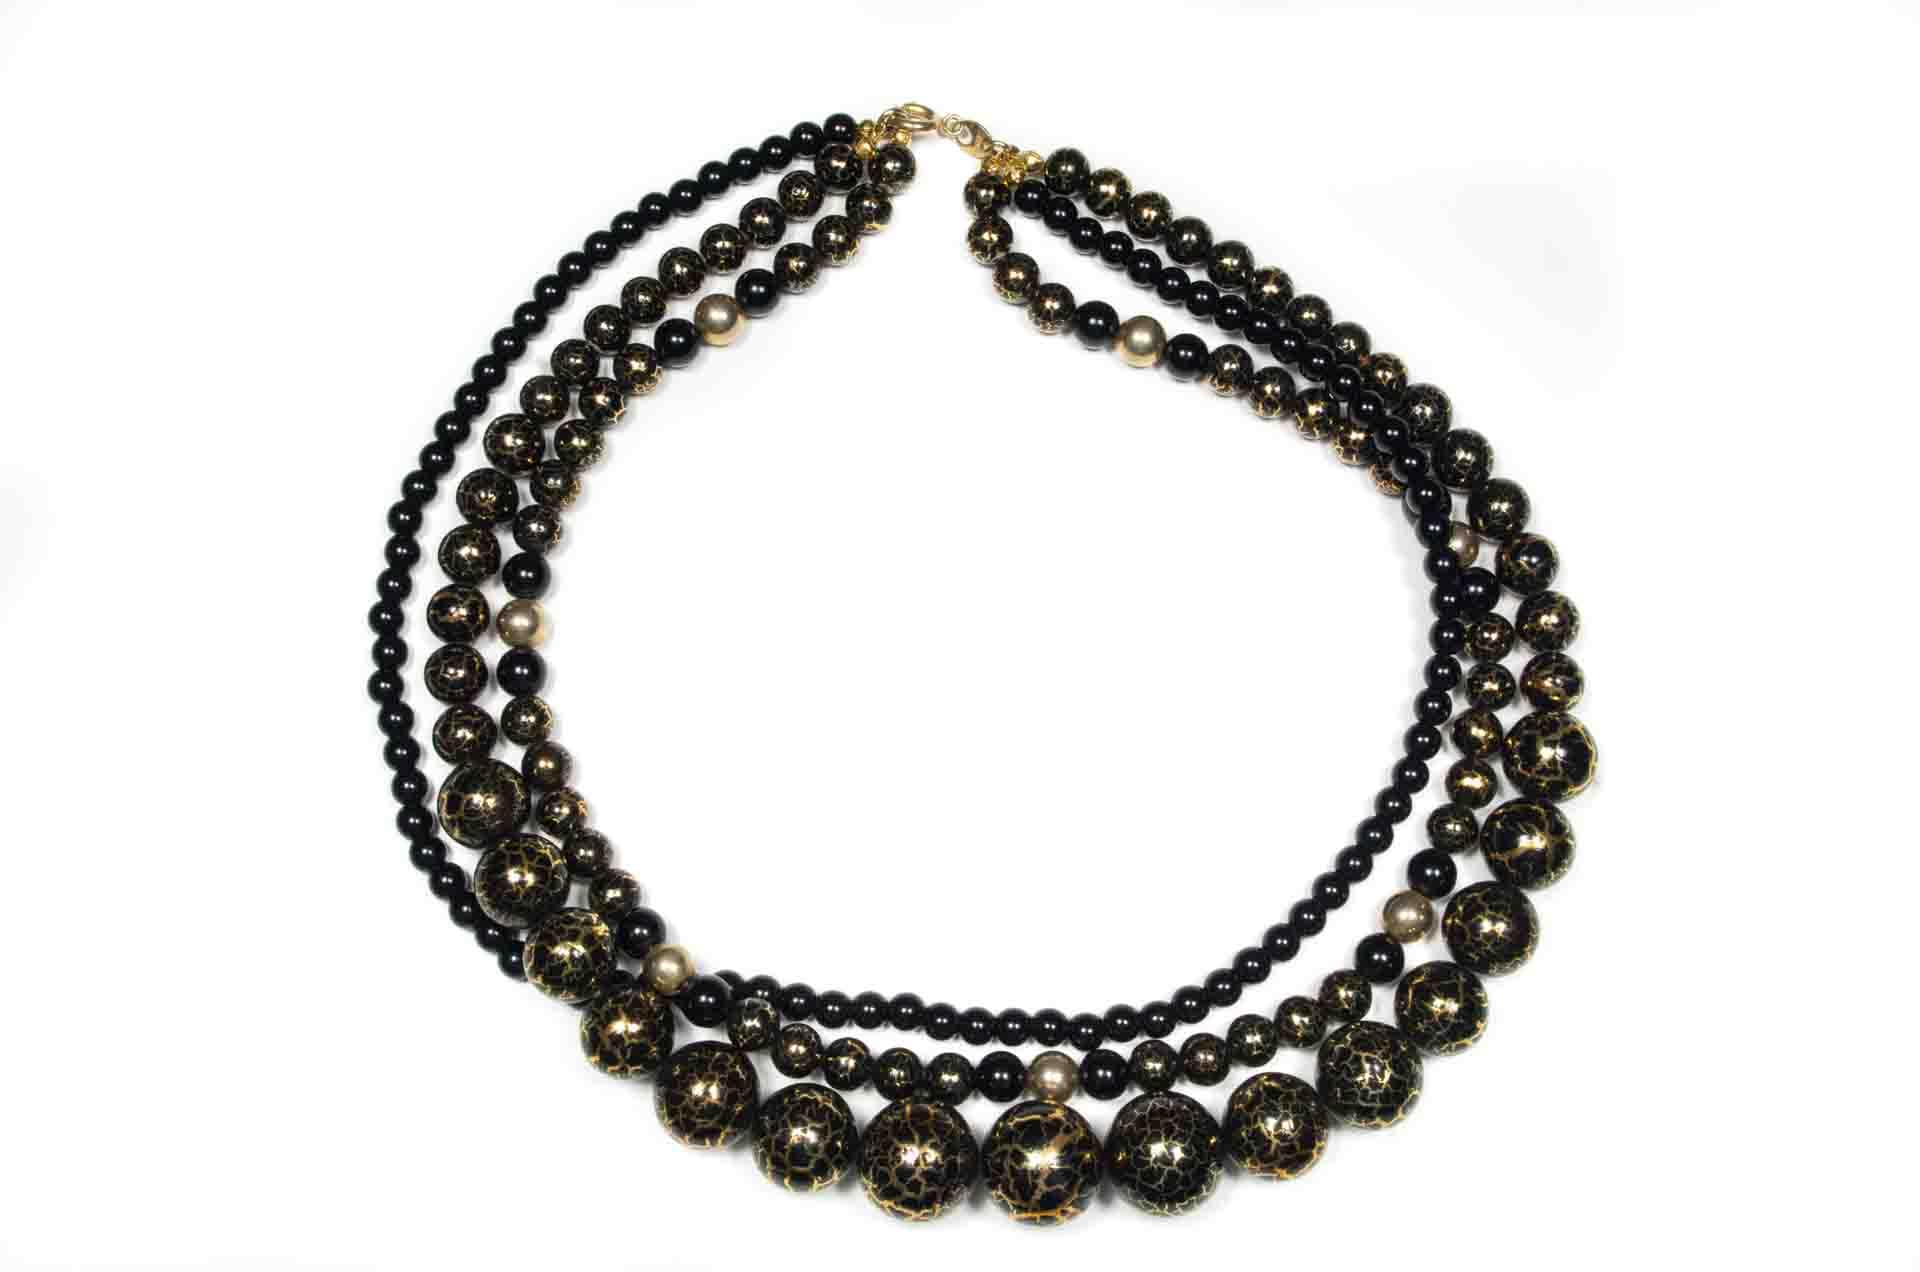 girocollo japan perle nere 2